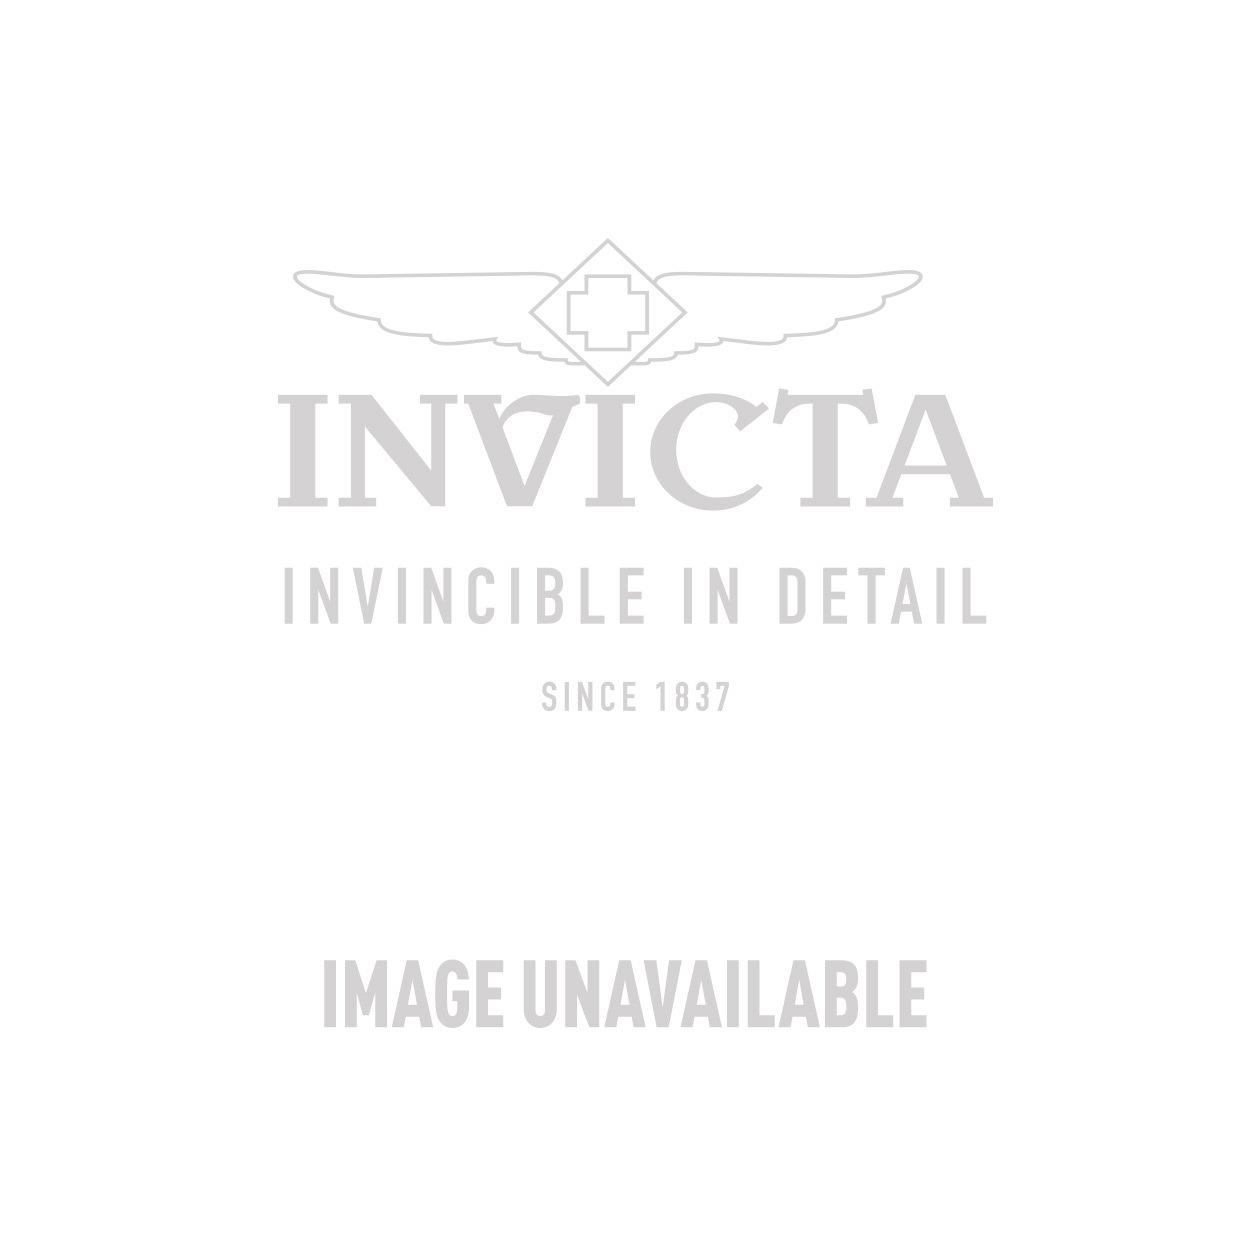 Invicta Sea Base Swiss Made Quartz Watch - Gold, Black case with Black tone Polyurethane band - Model 17536